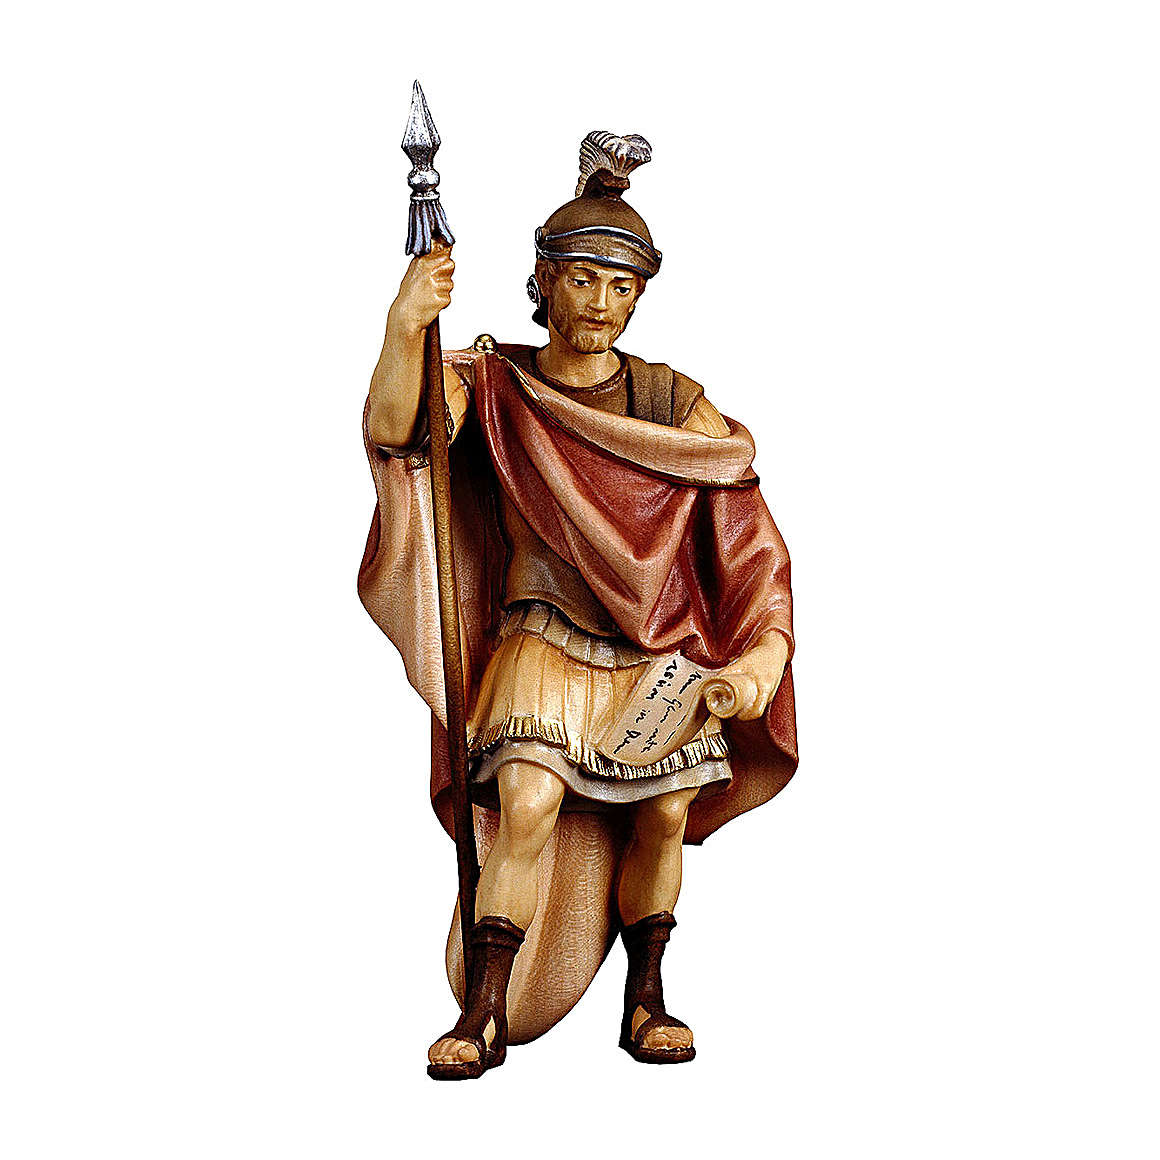 Soldato romano presepe Original legno dipinto Valgardena 12 cm 4